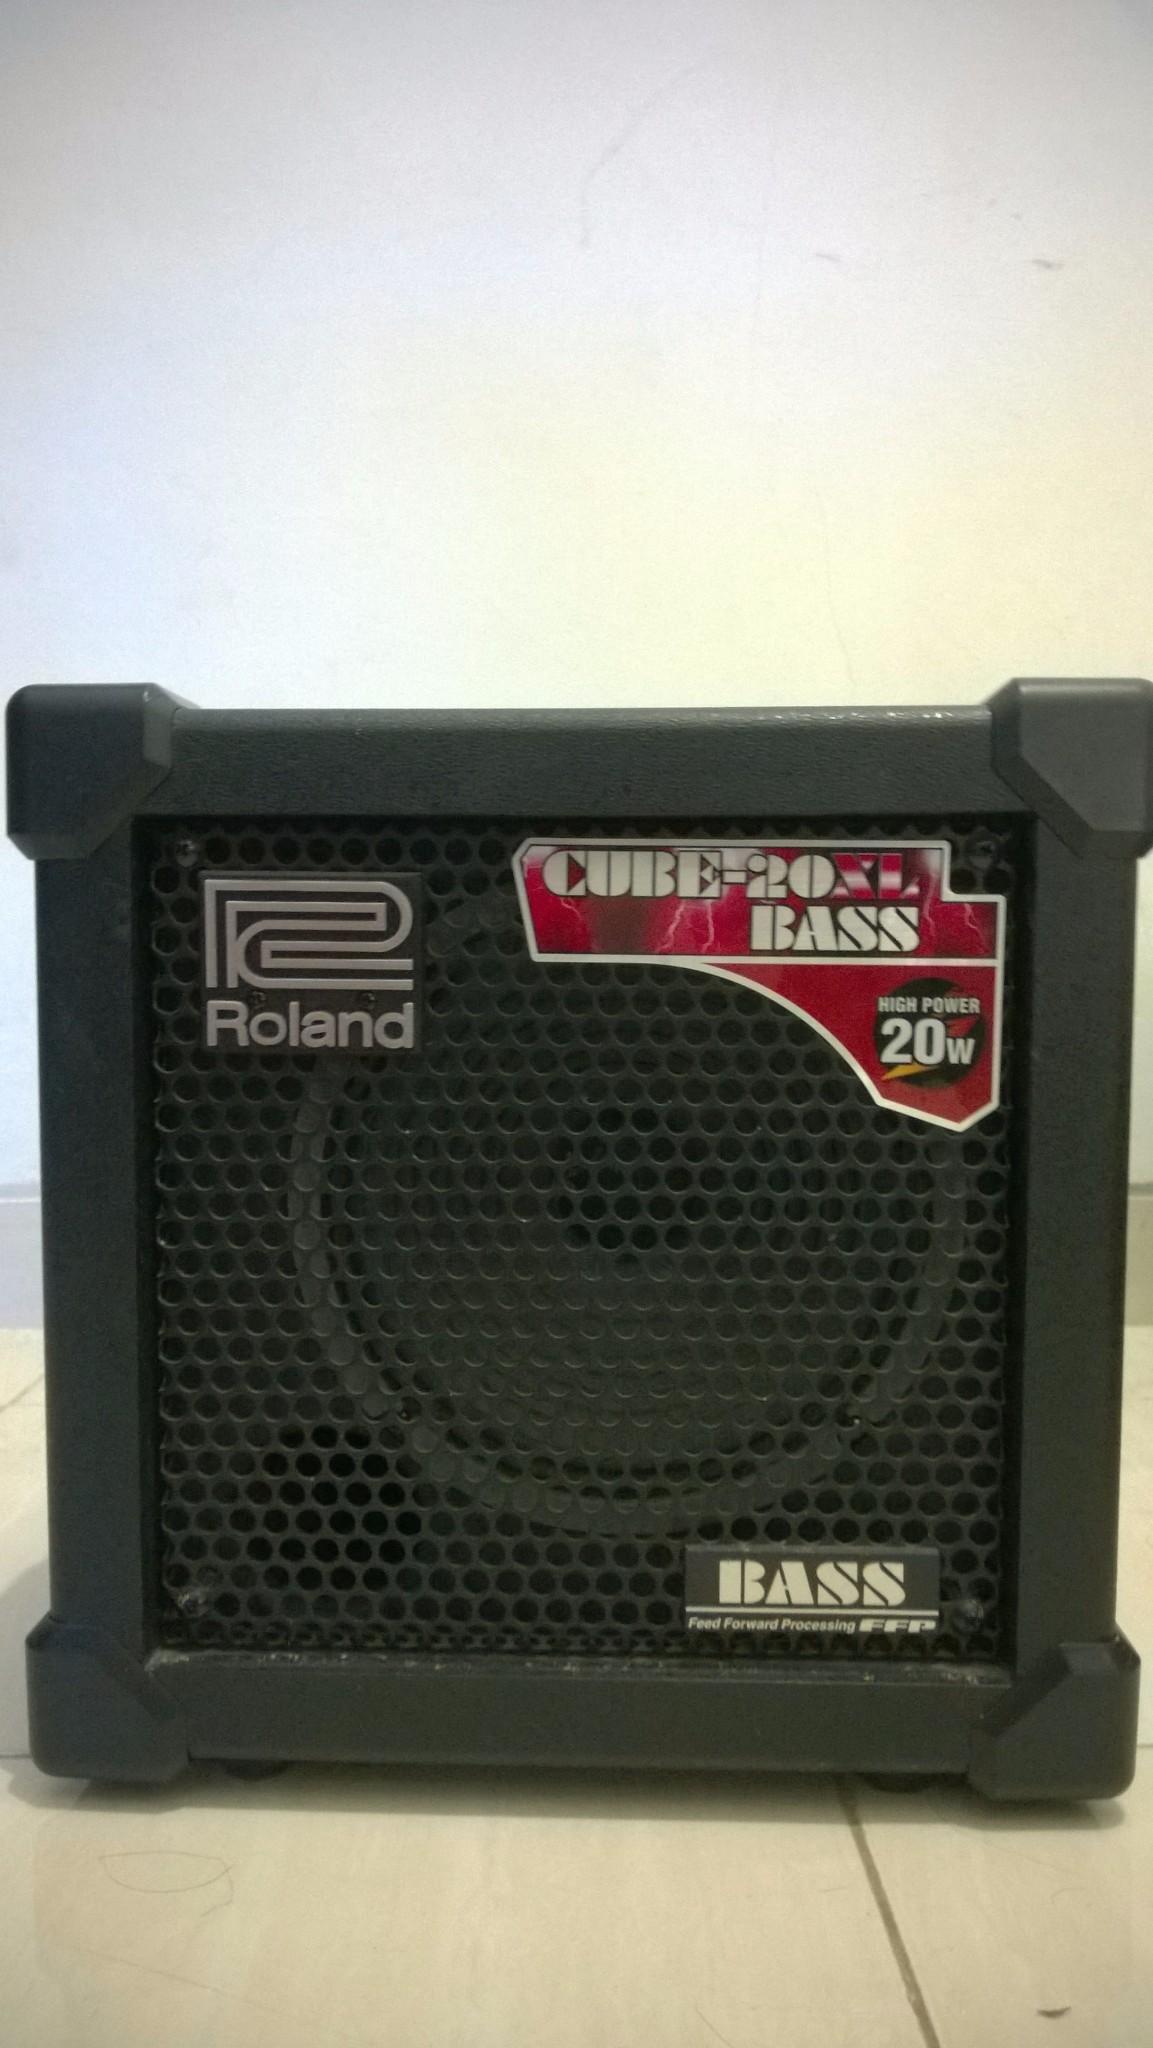 harga Roland Cube 20 XL Bass Tokopedia.com